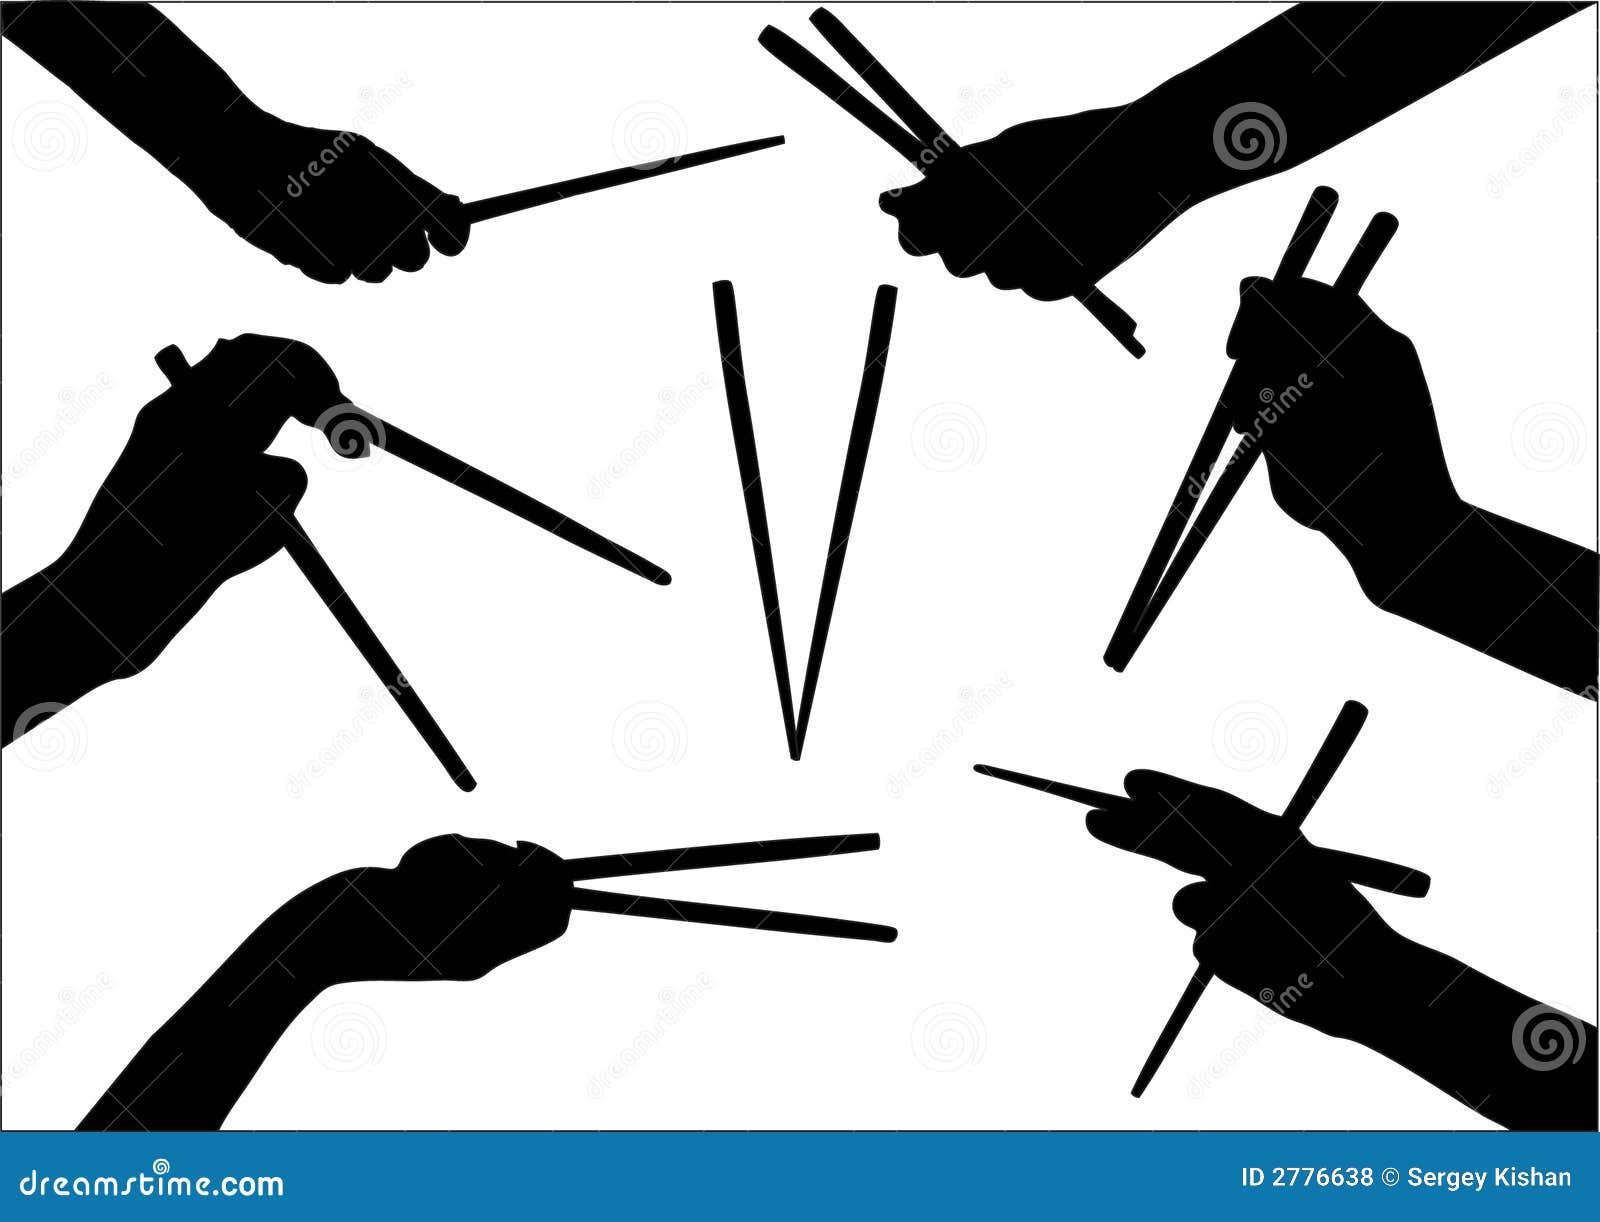 Chopstick Stock Illustrations – 1,518 Chopstick Stock ...